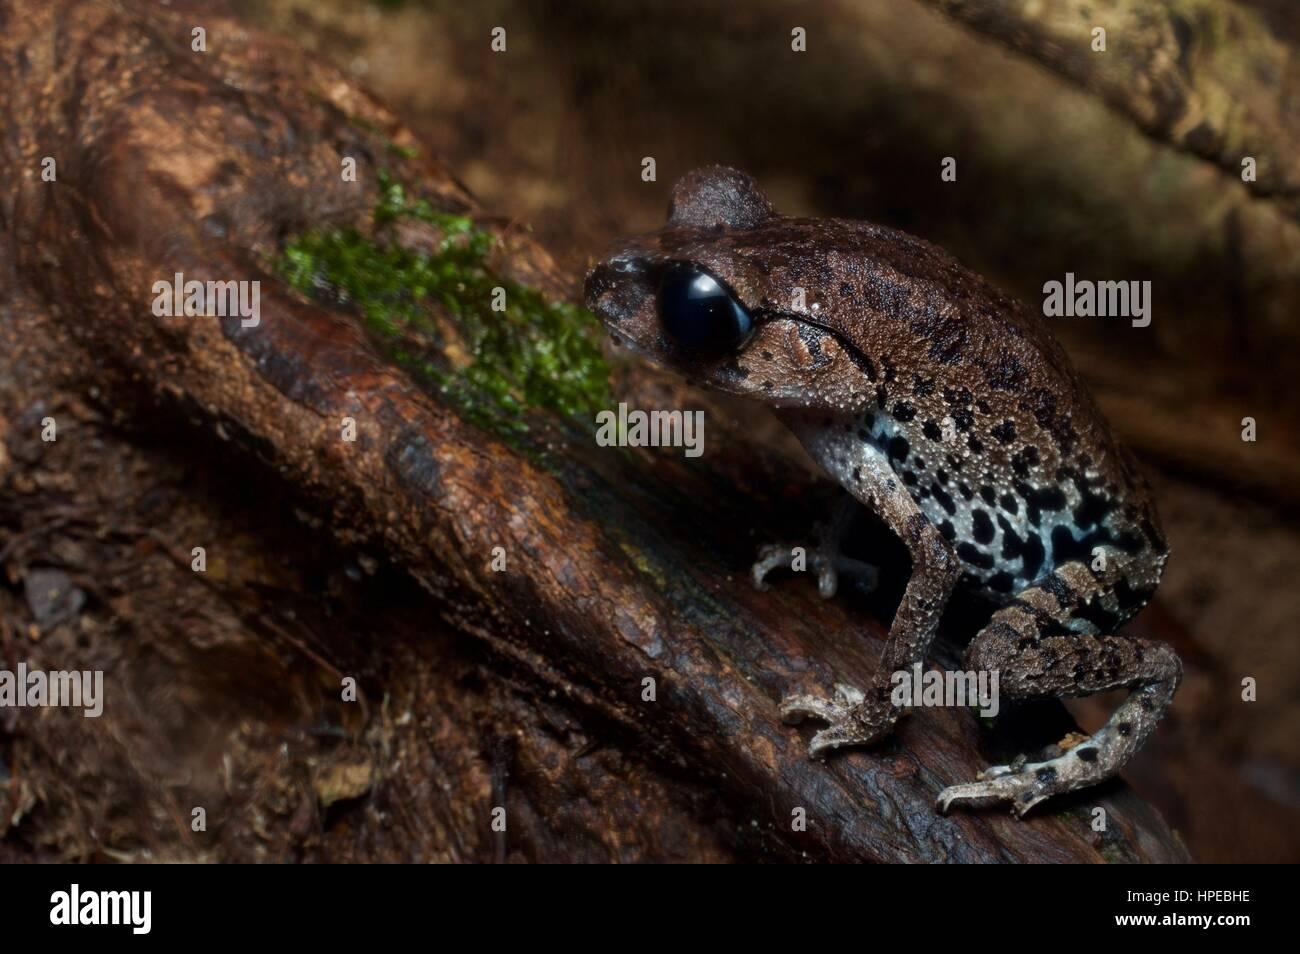 An Inger's Black-eyed Litter Frog (Leptobrachium ingeri) in Santubong National Park, Sarawak, East Malaysia, - Stock Image